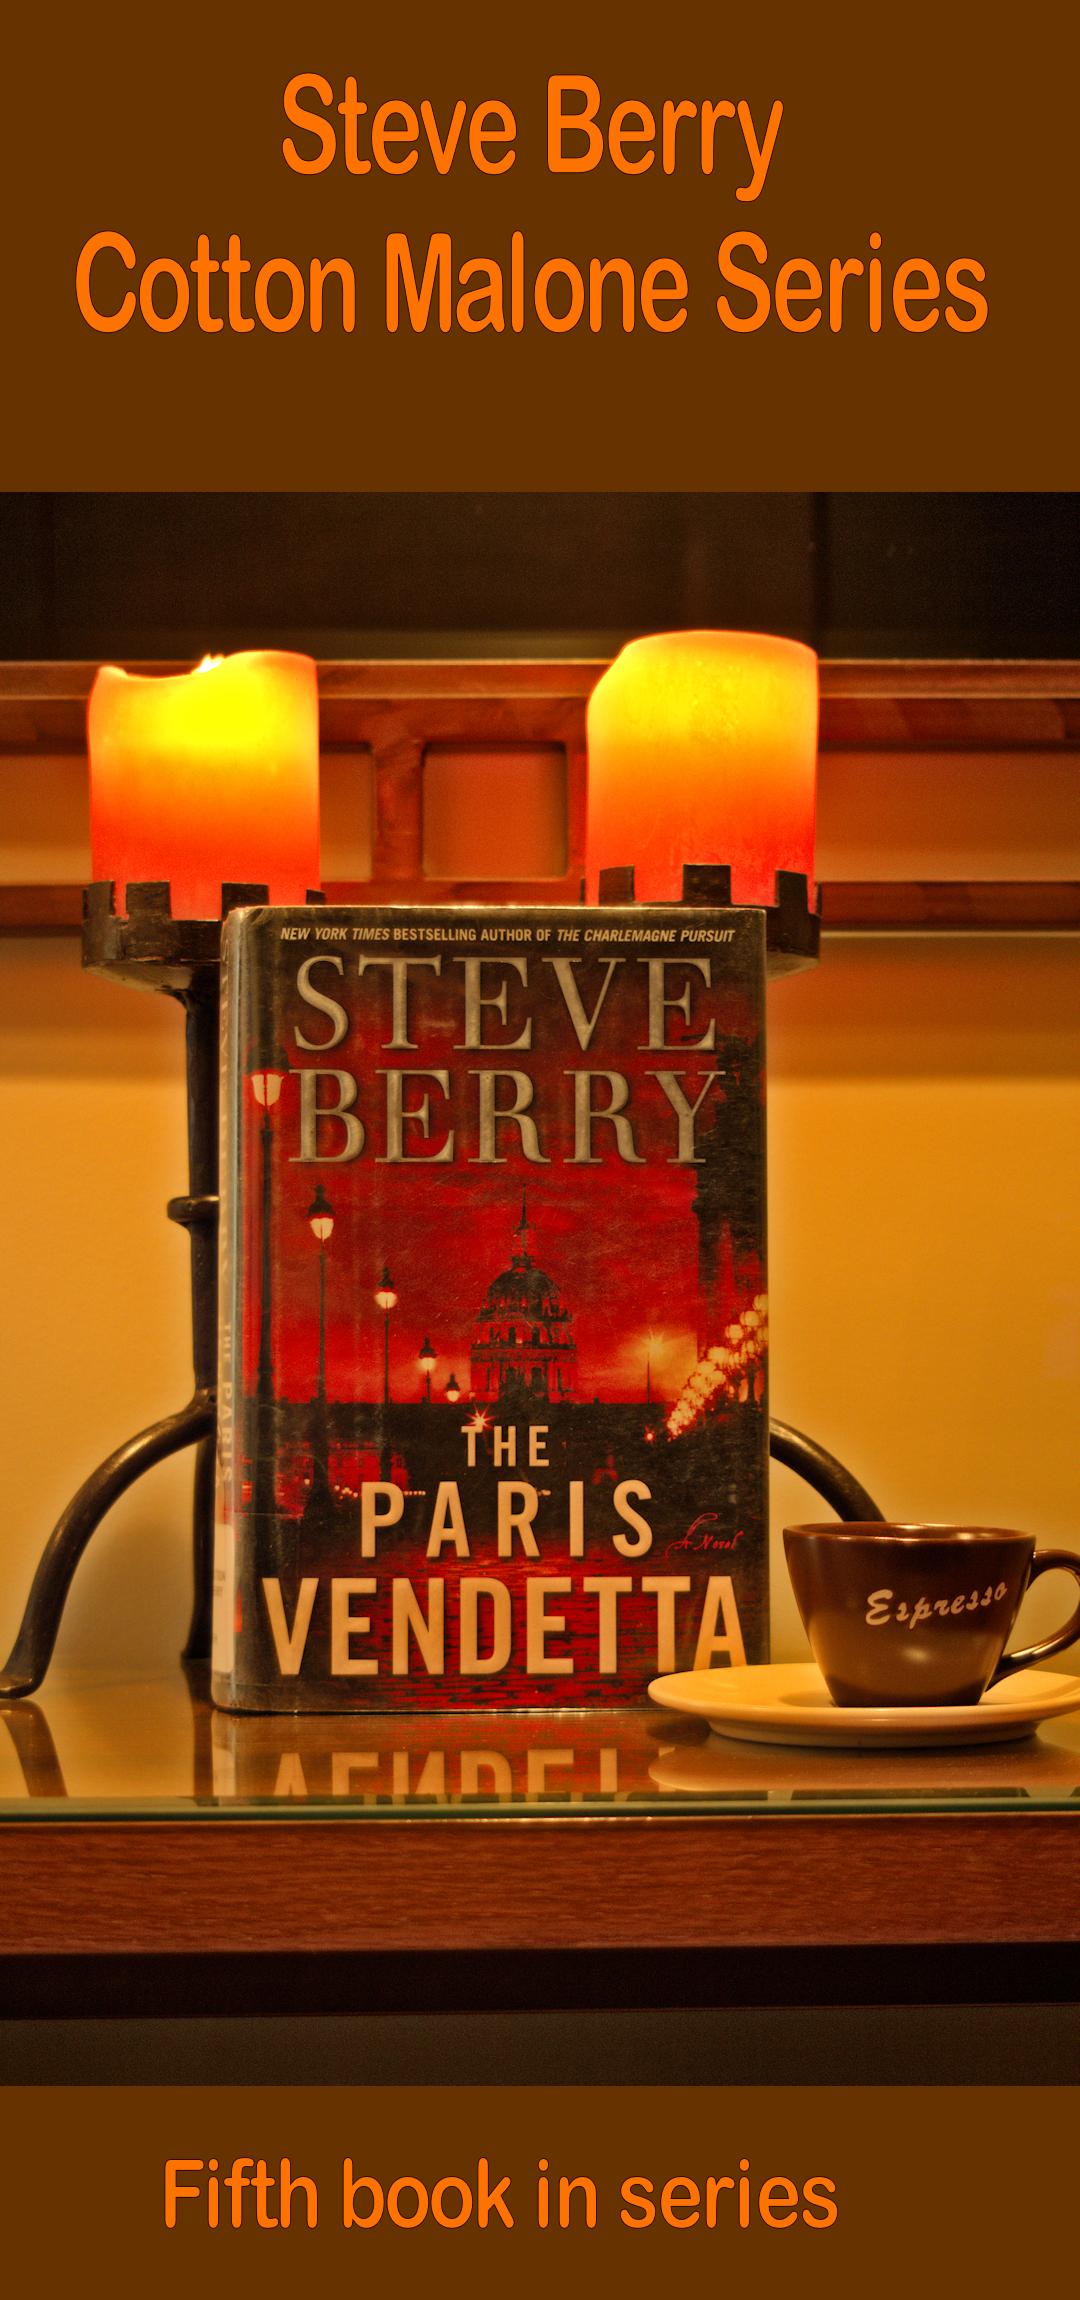 Paris Vendetta - Steve Berry - Cotton Malone Series - Fifth book in series.